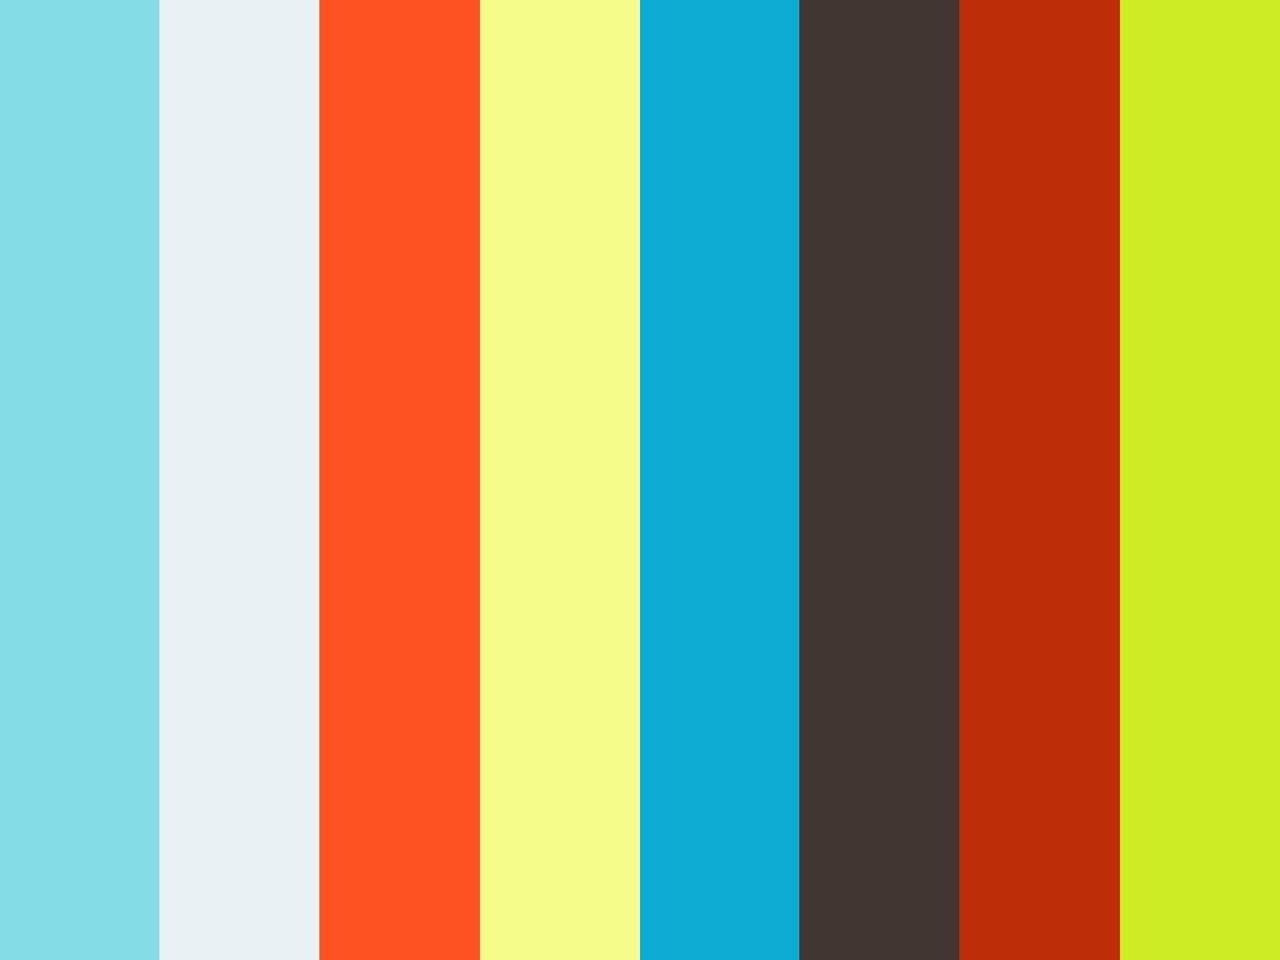 Molokai Covid19 Update - Friday, April 17, 2020